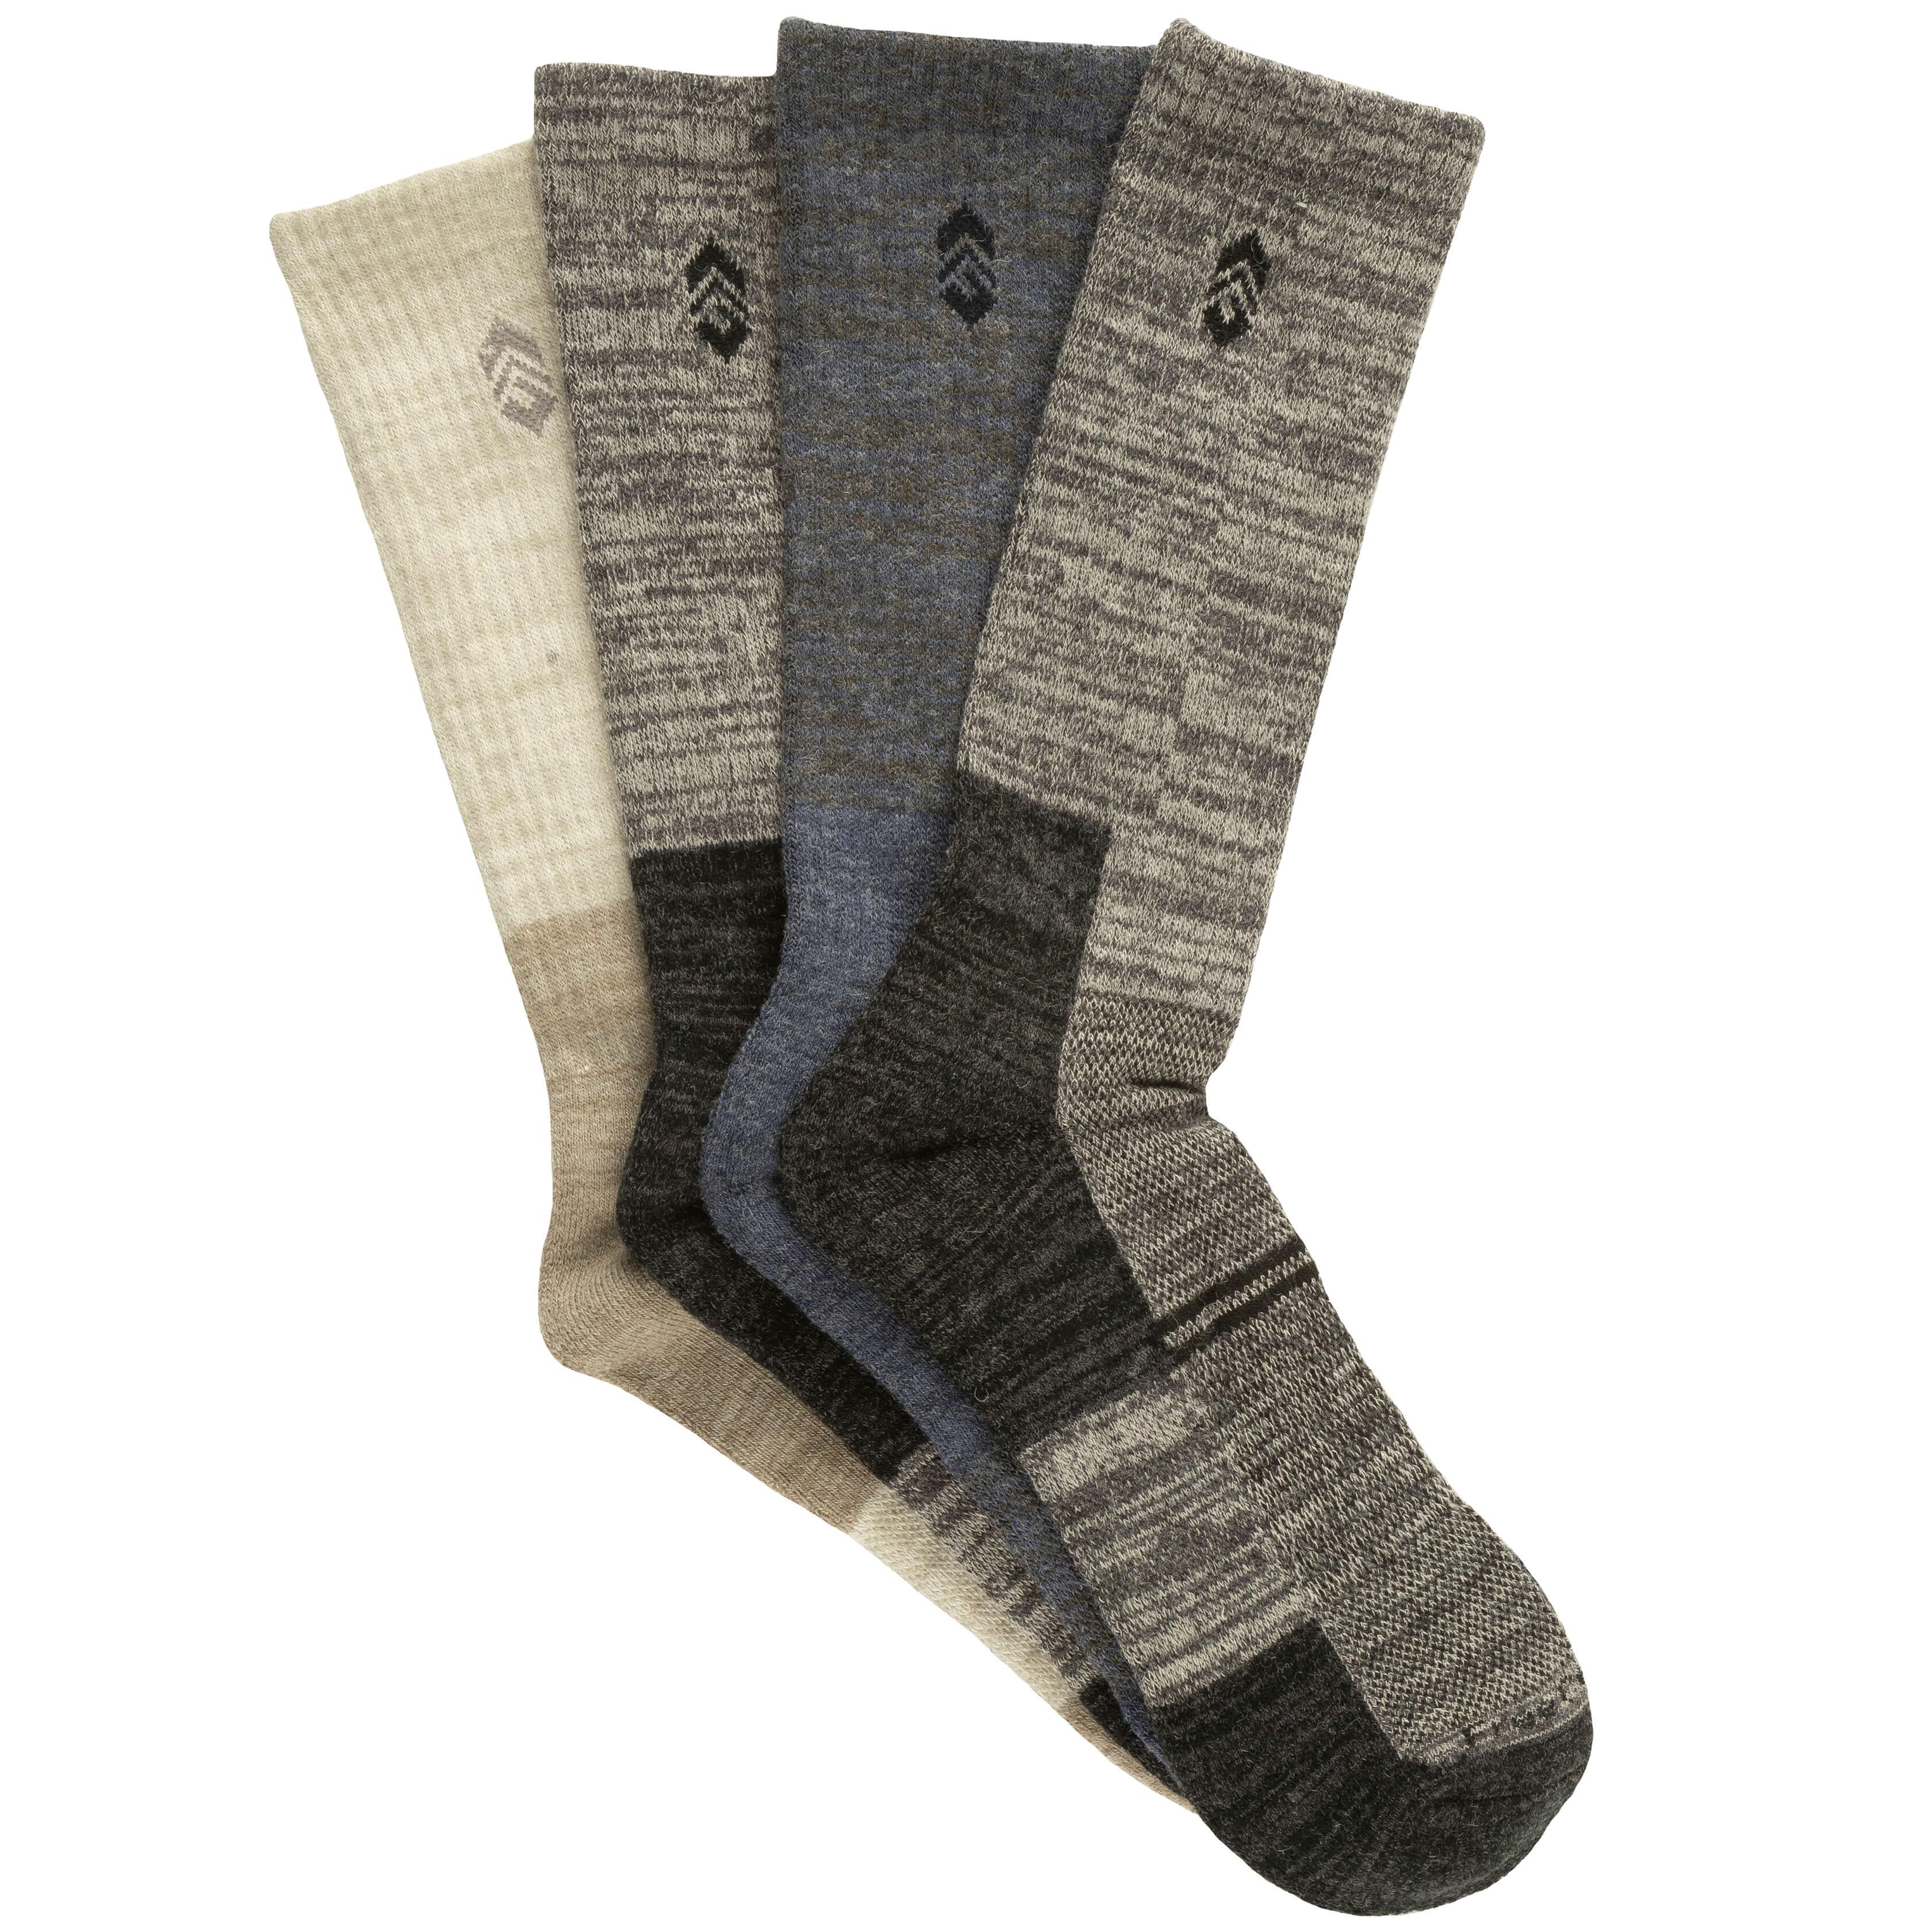 Men's Wool-Blend Marled Wardrobe Crew Socks